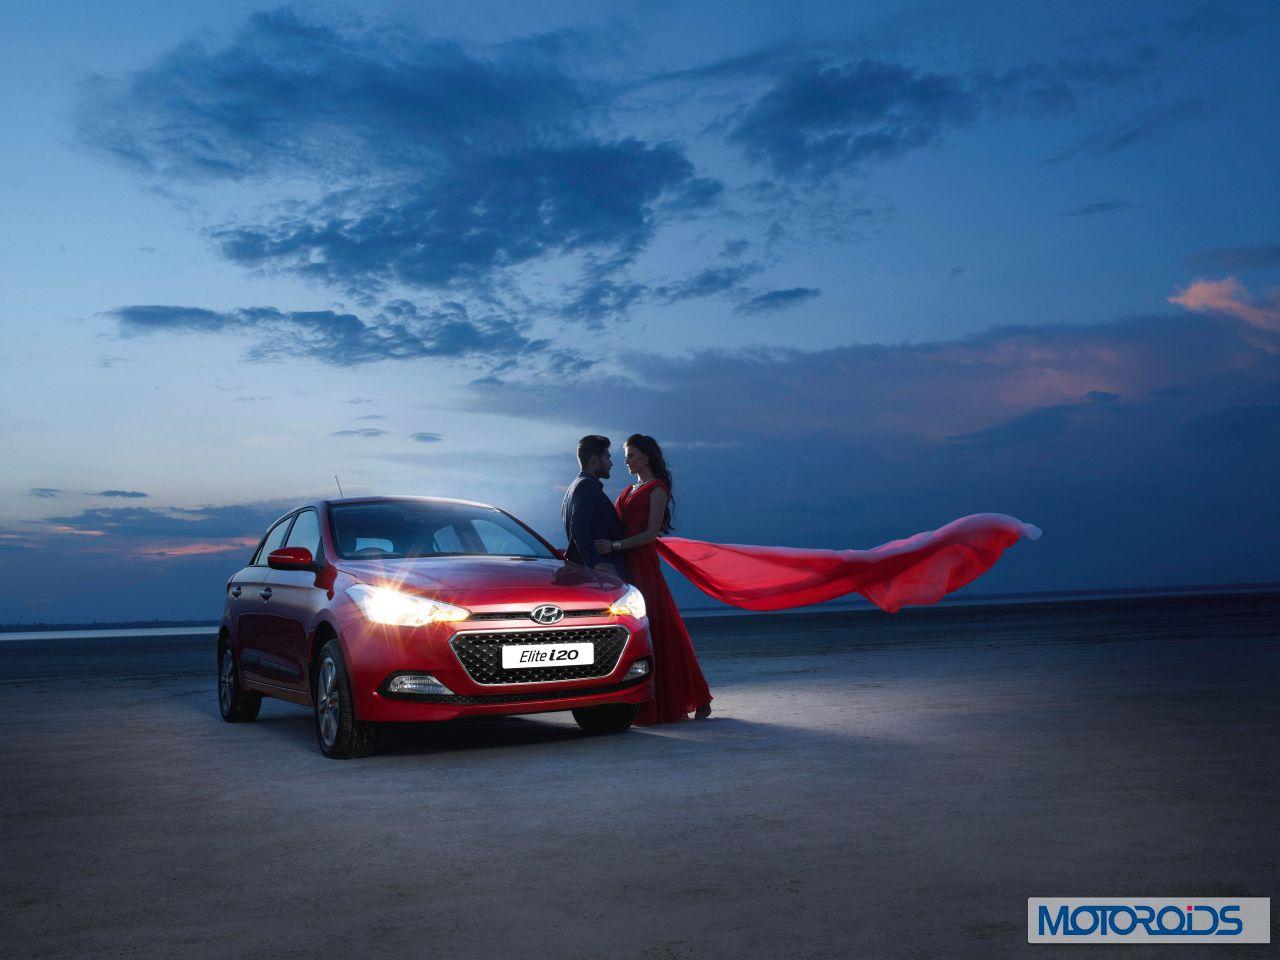 Hyundai Elite i20 vs VW Polo VS Maruti Swift vs Fiat Punto Evo: Specs and  Features Compared | Motoroids